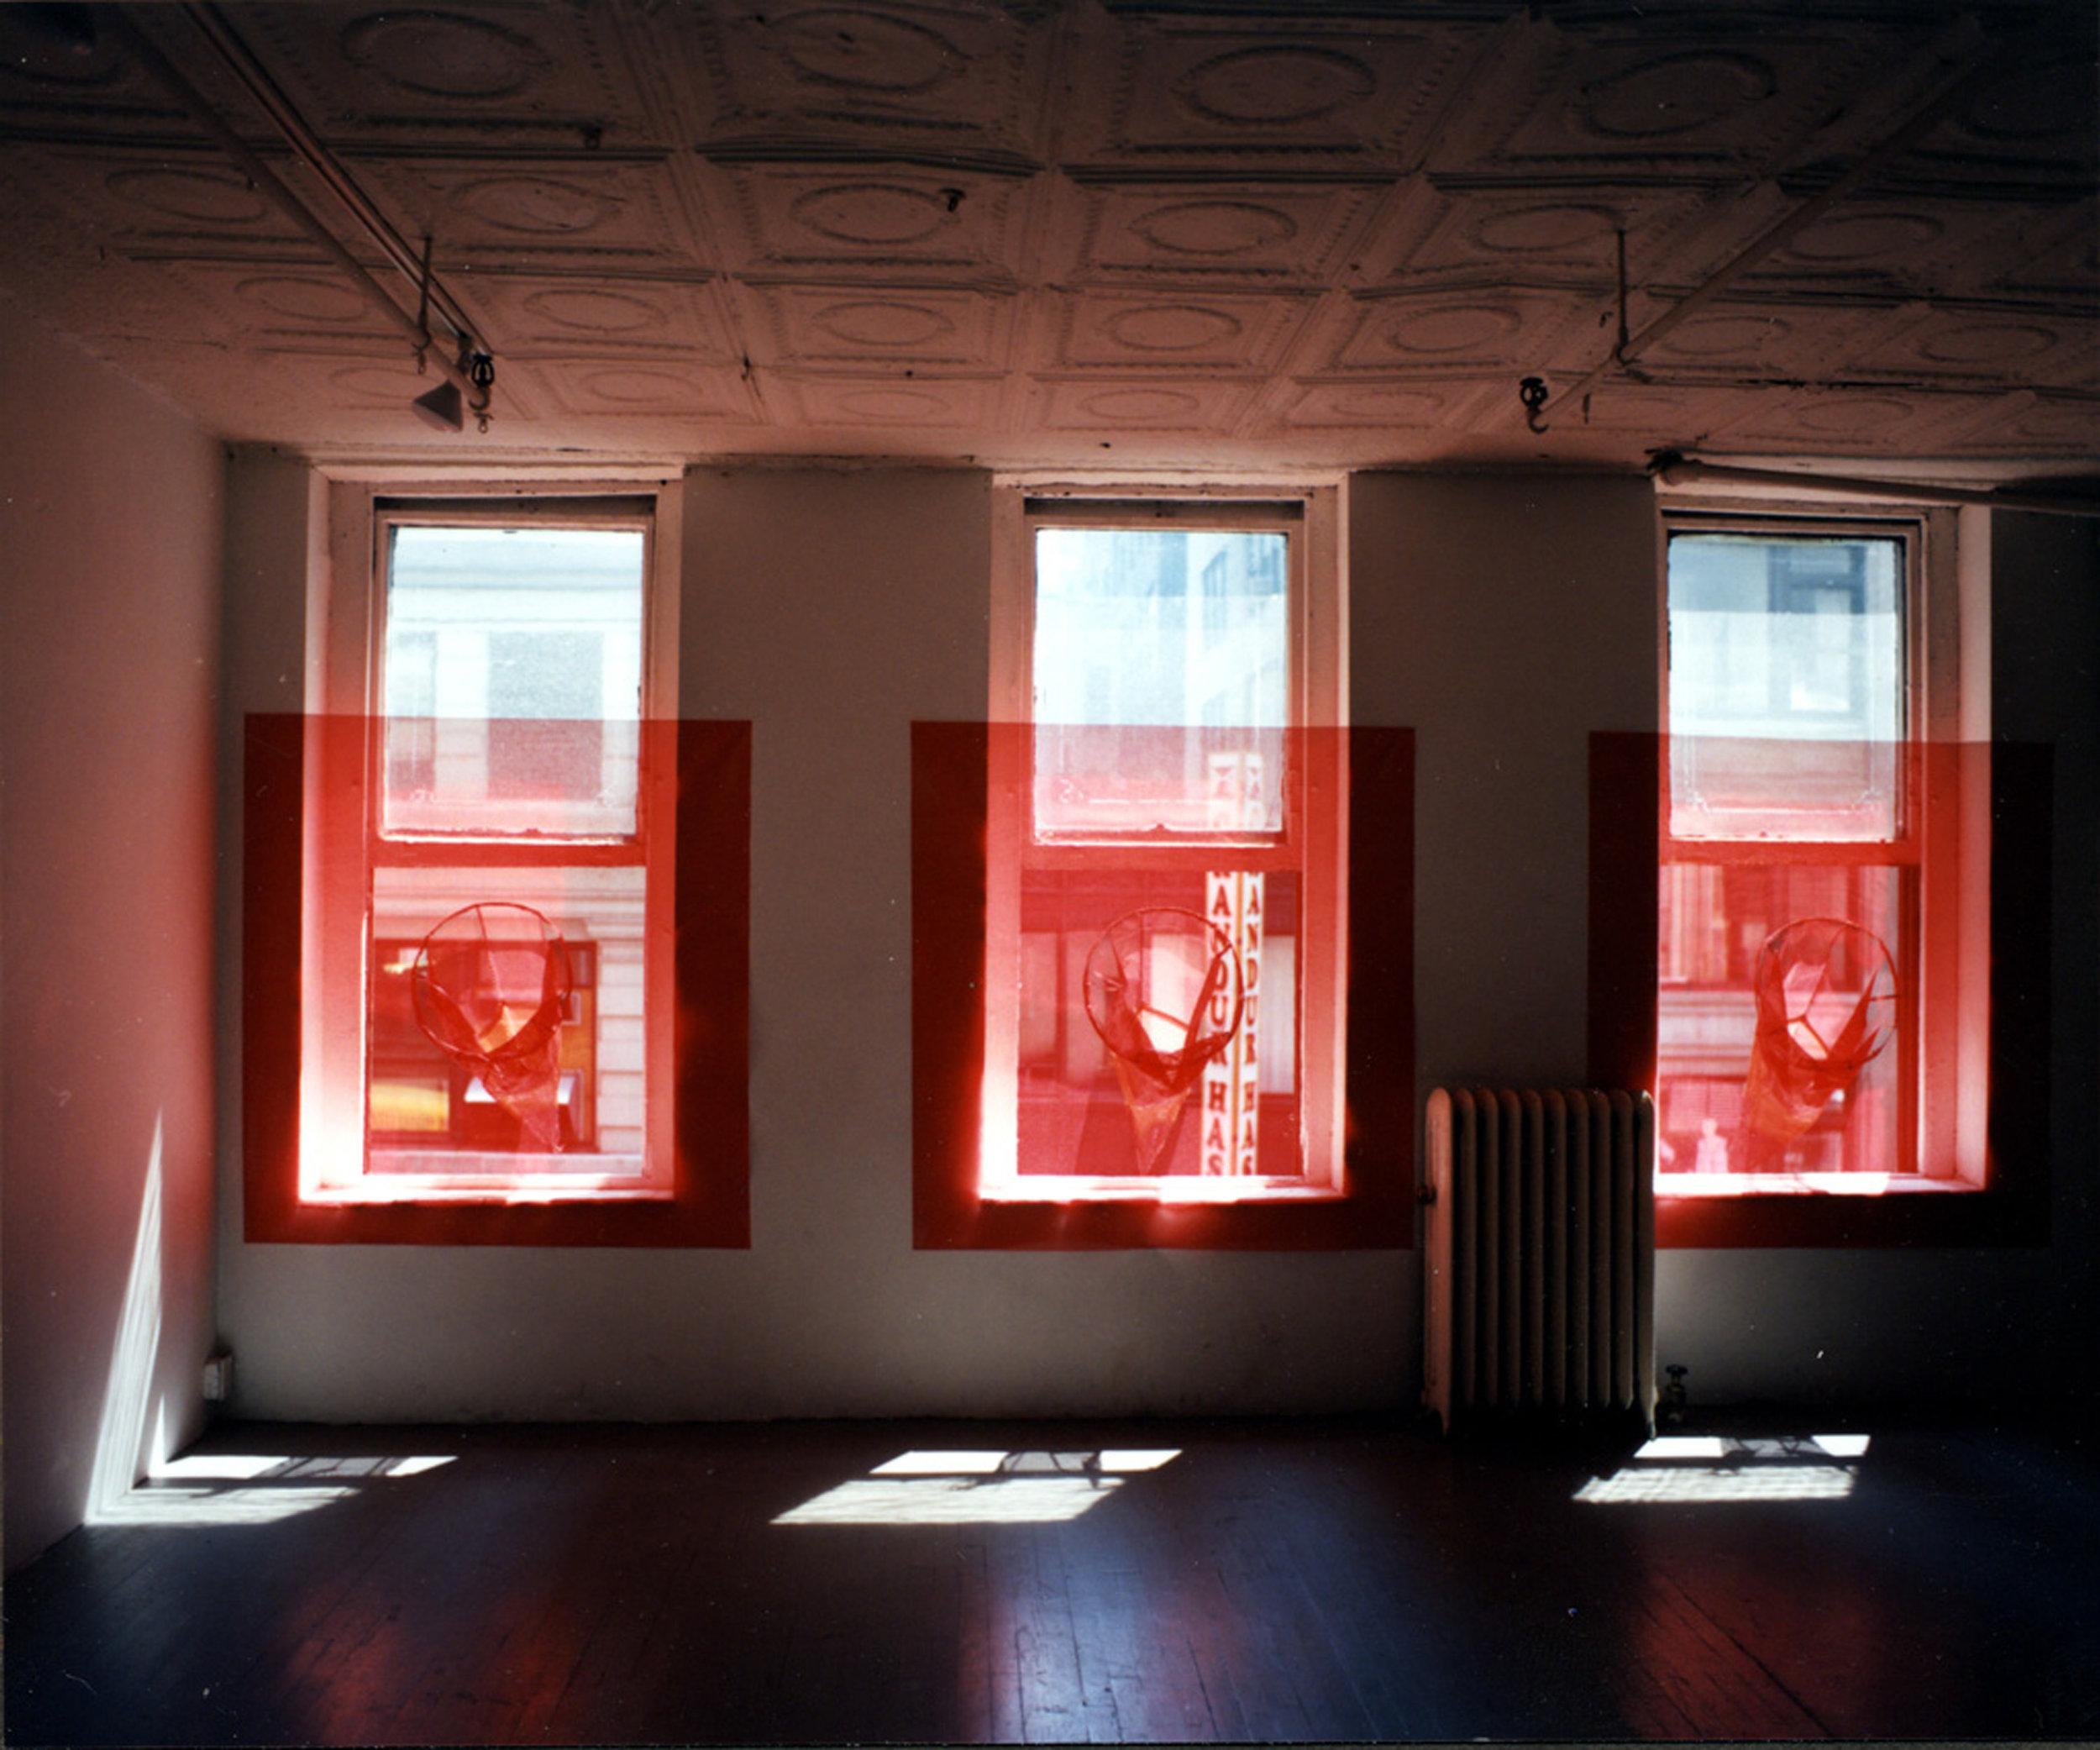 RED SPIKES ON 29TH STREET_Echelman_PhotoStudioEchelman_2.jpg